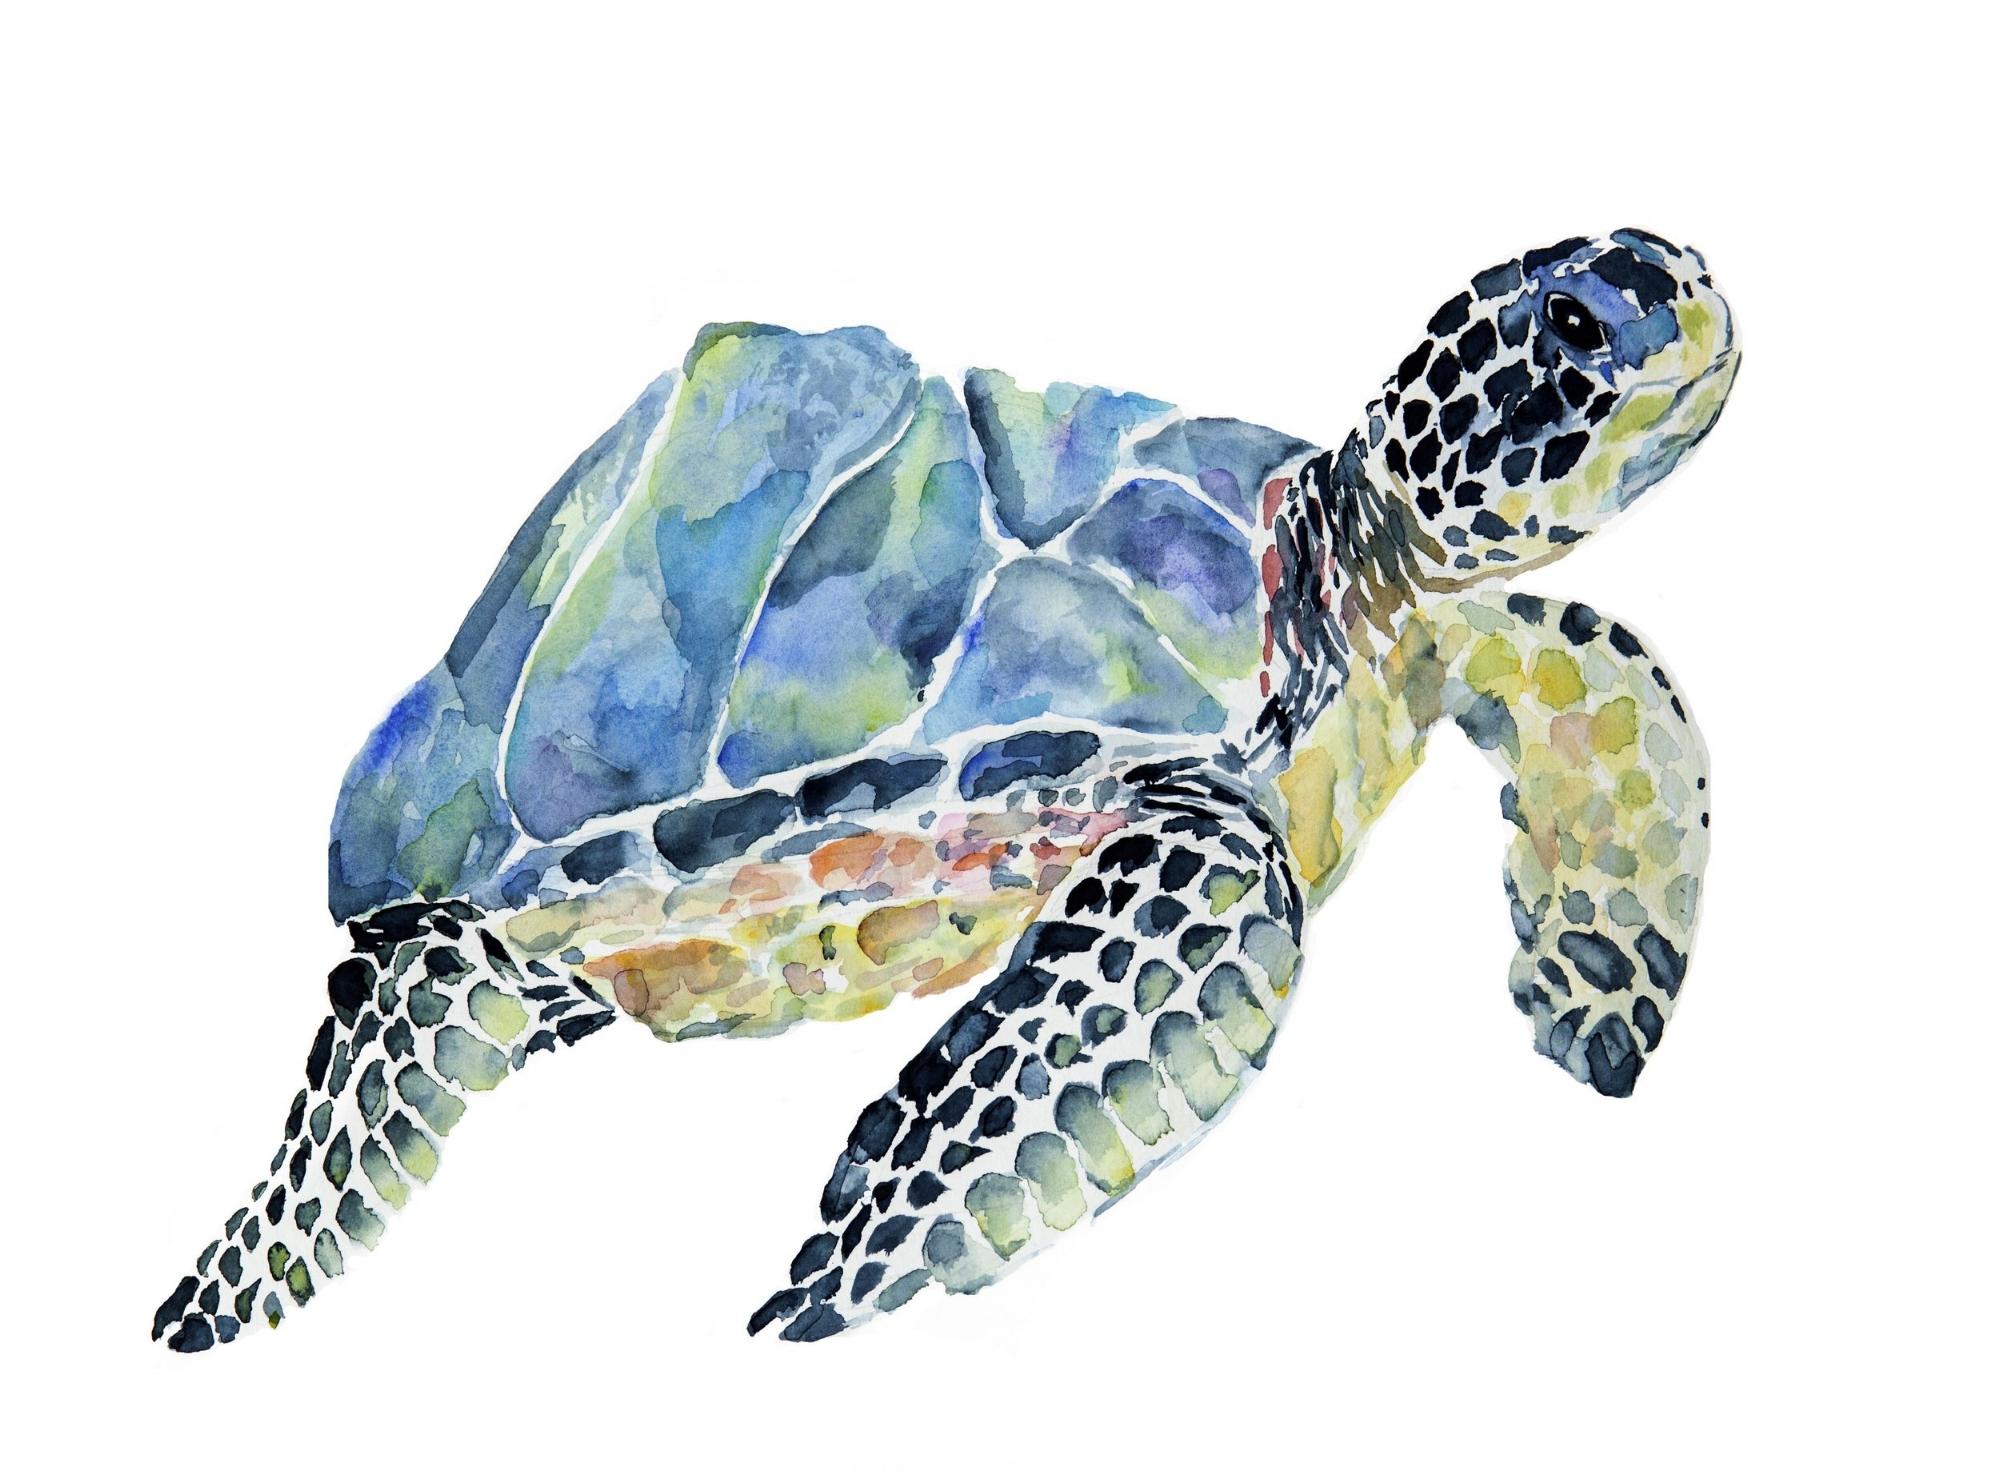 """Marbled Loggerhead Turtle"" 12x16 Original is Available"